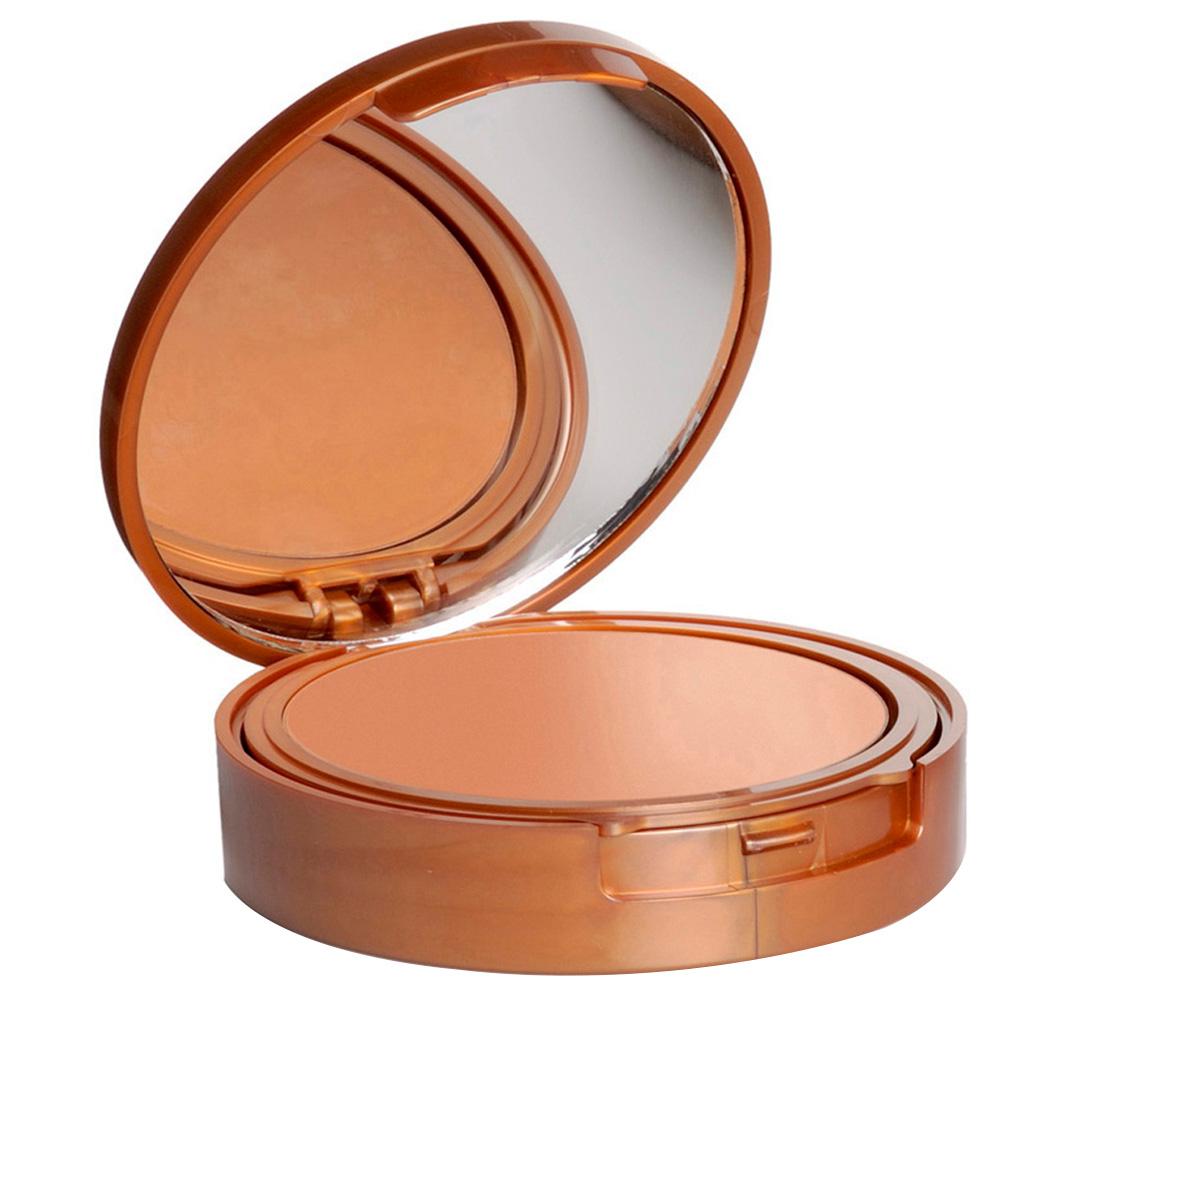 Protectie solara - Fond de ten compact cu vitamina E si ulei din orez brun, SFP 15, rezistent la apa